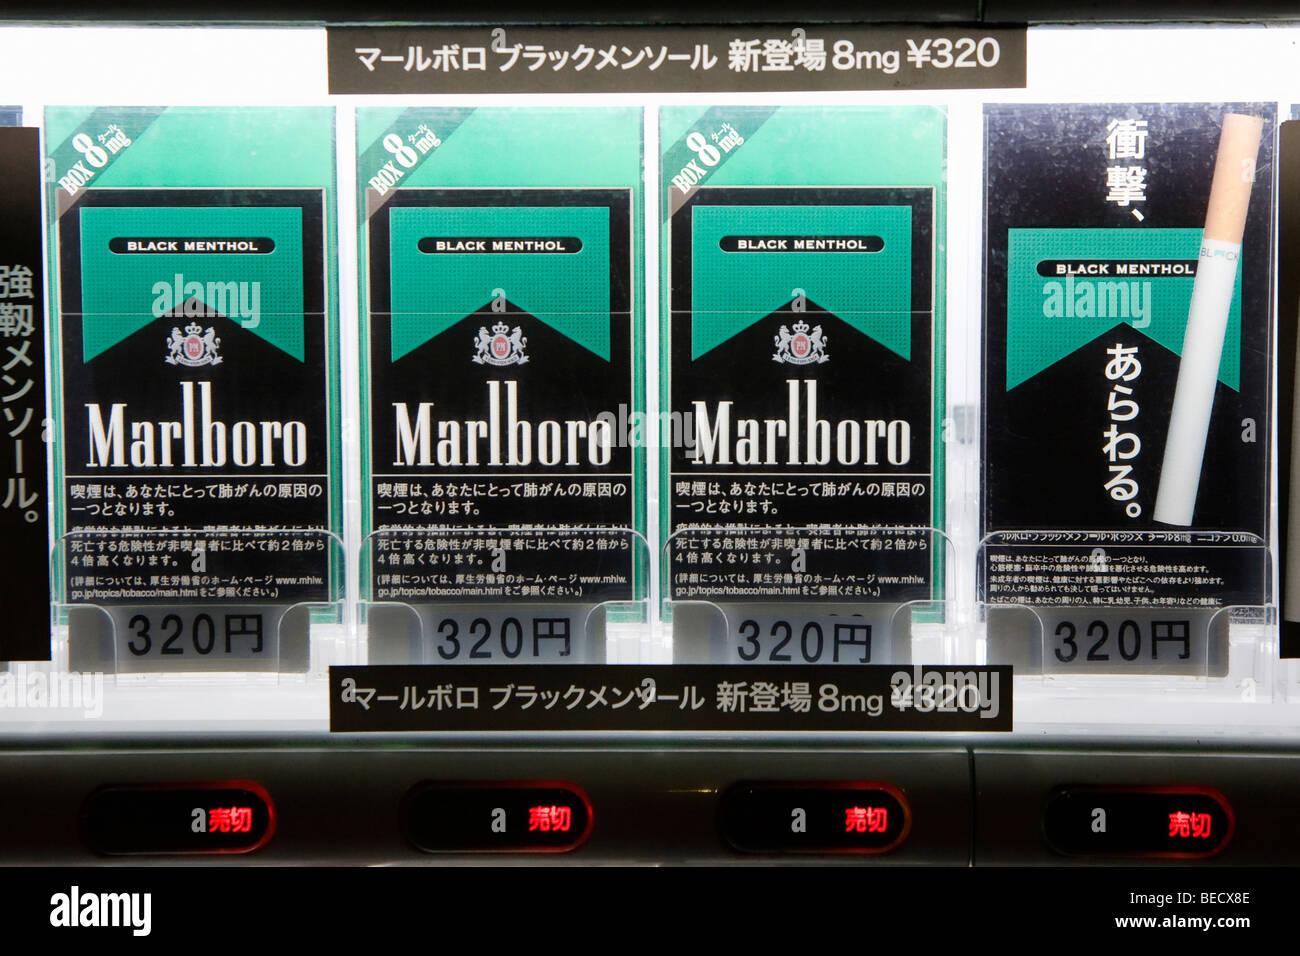 The buy cigarettes Peter Stuyvesant